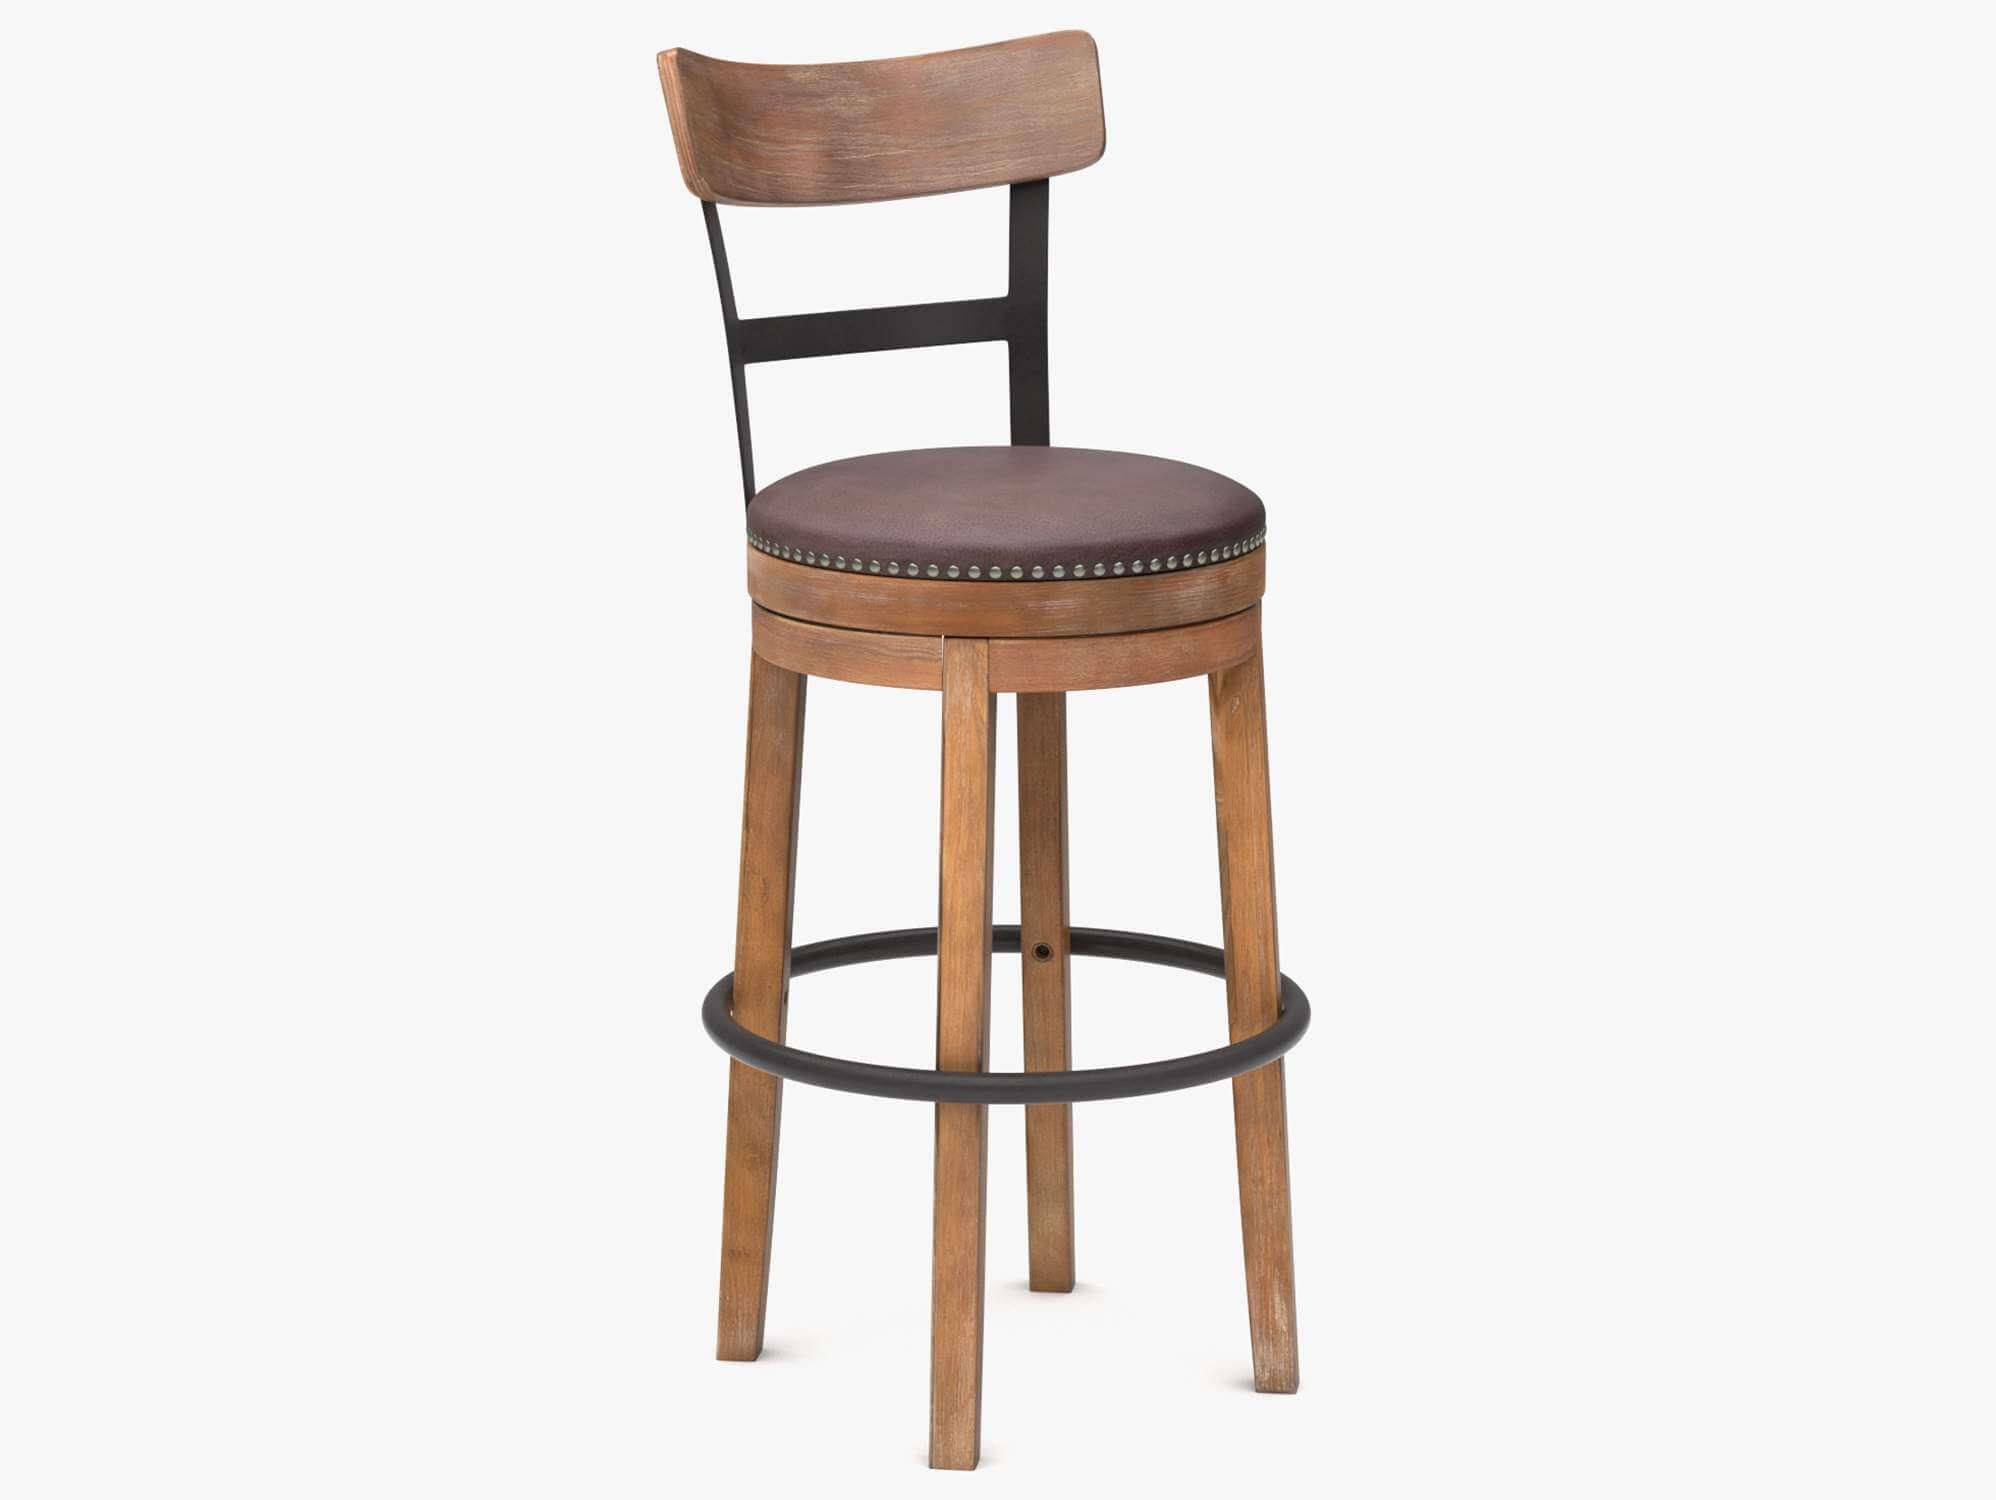 Incredible Wooden Pub Chair 3D Model Machost Co Dining Chair Design Ideas Machostcouk